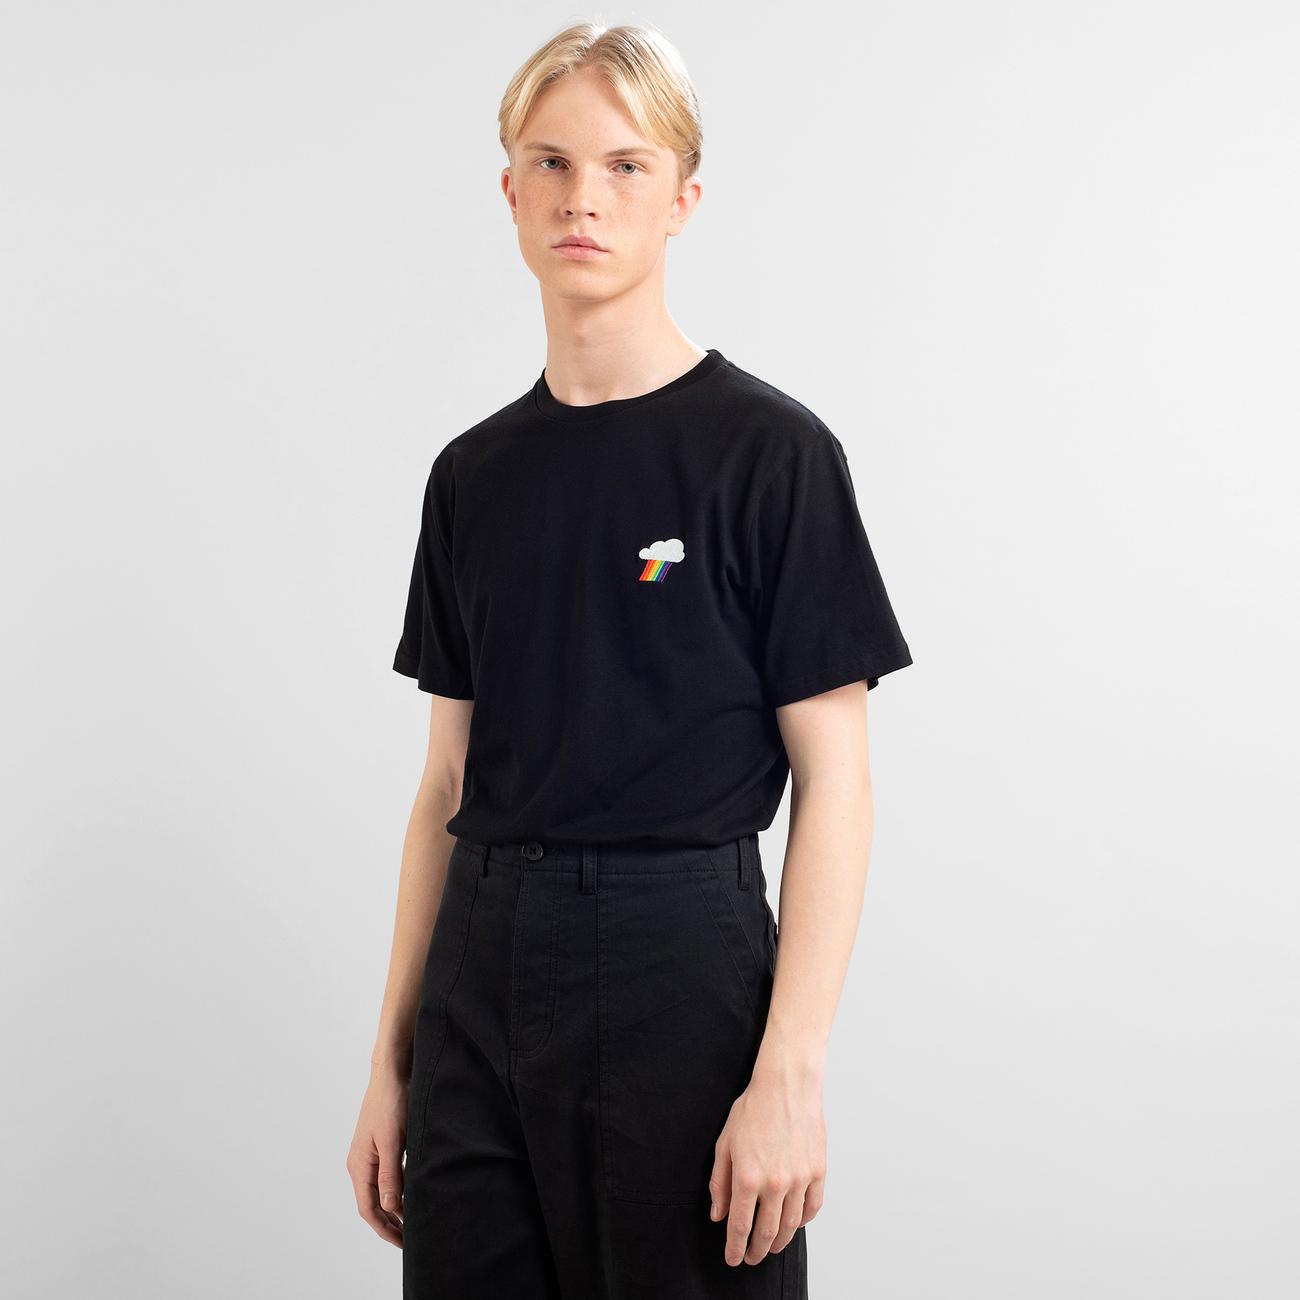 T-shirt Stockholm Rainbow Cloud